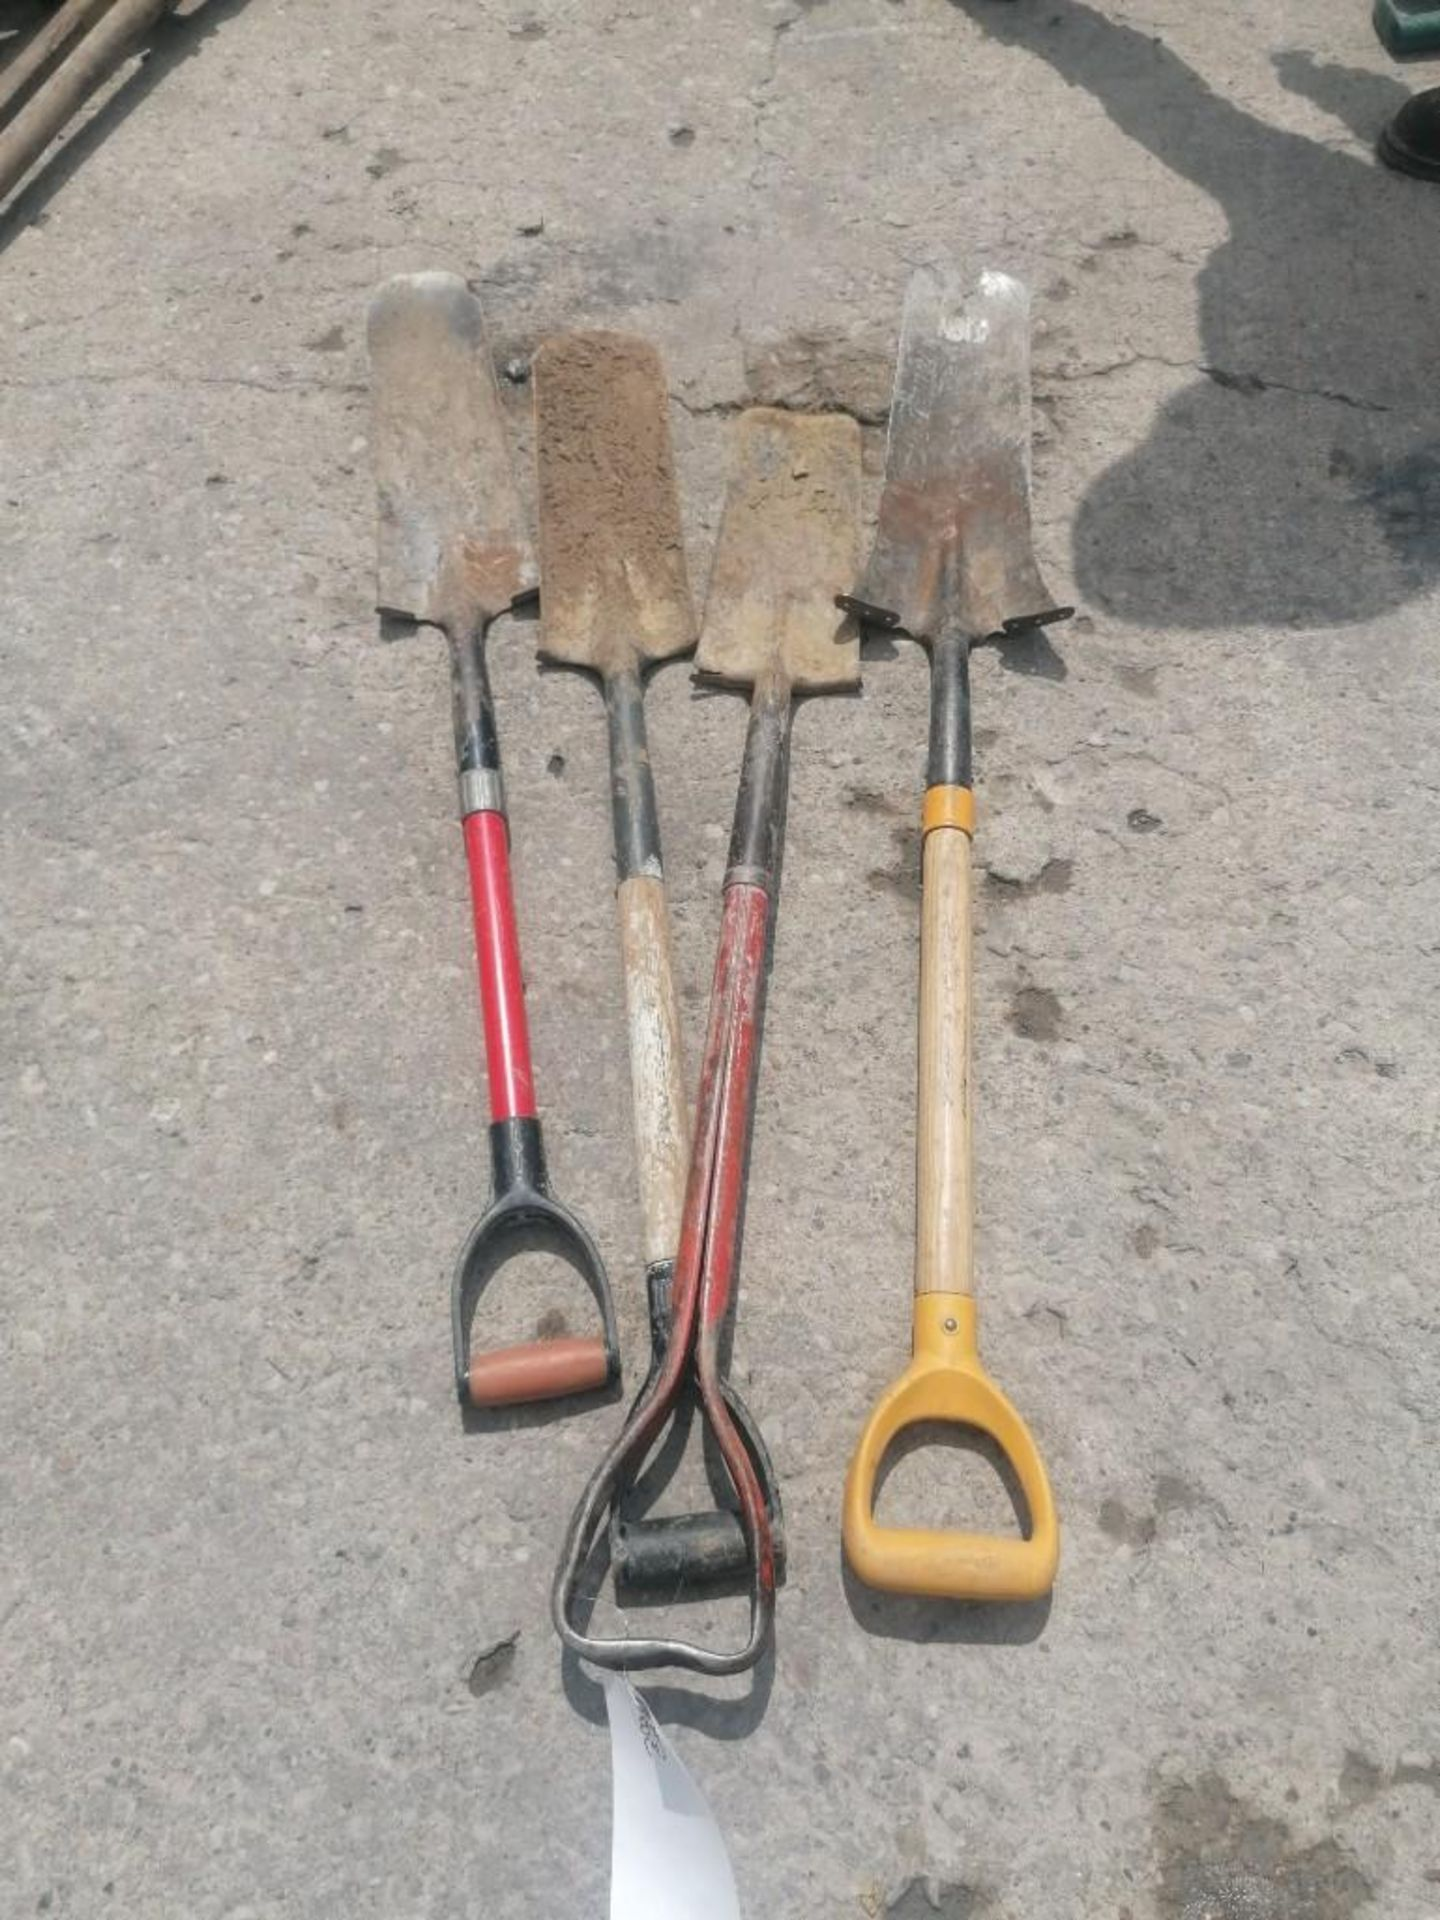 Lot 60 - (4) Shovels. Located at 301 E Henry Street, Mt. Pleasant, IA 52641.